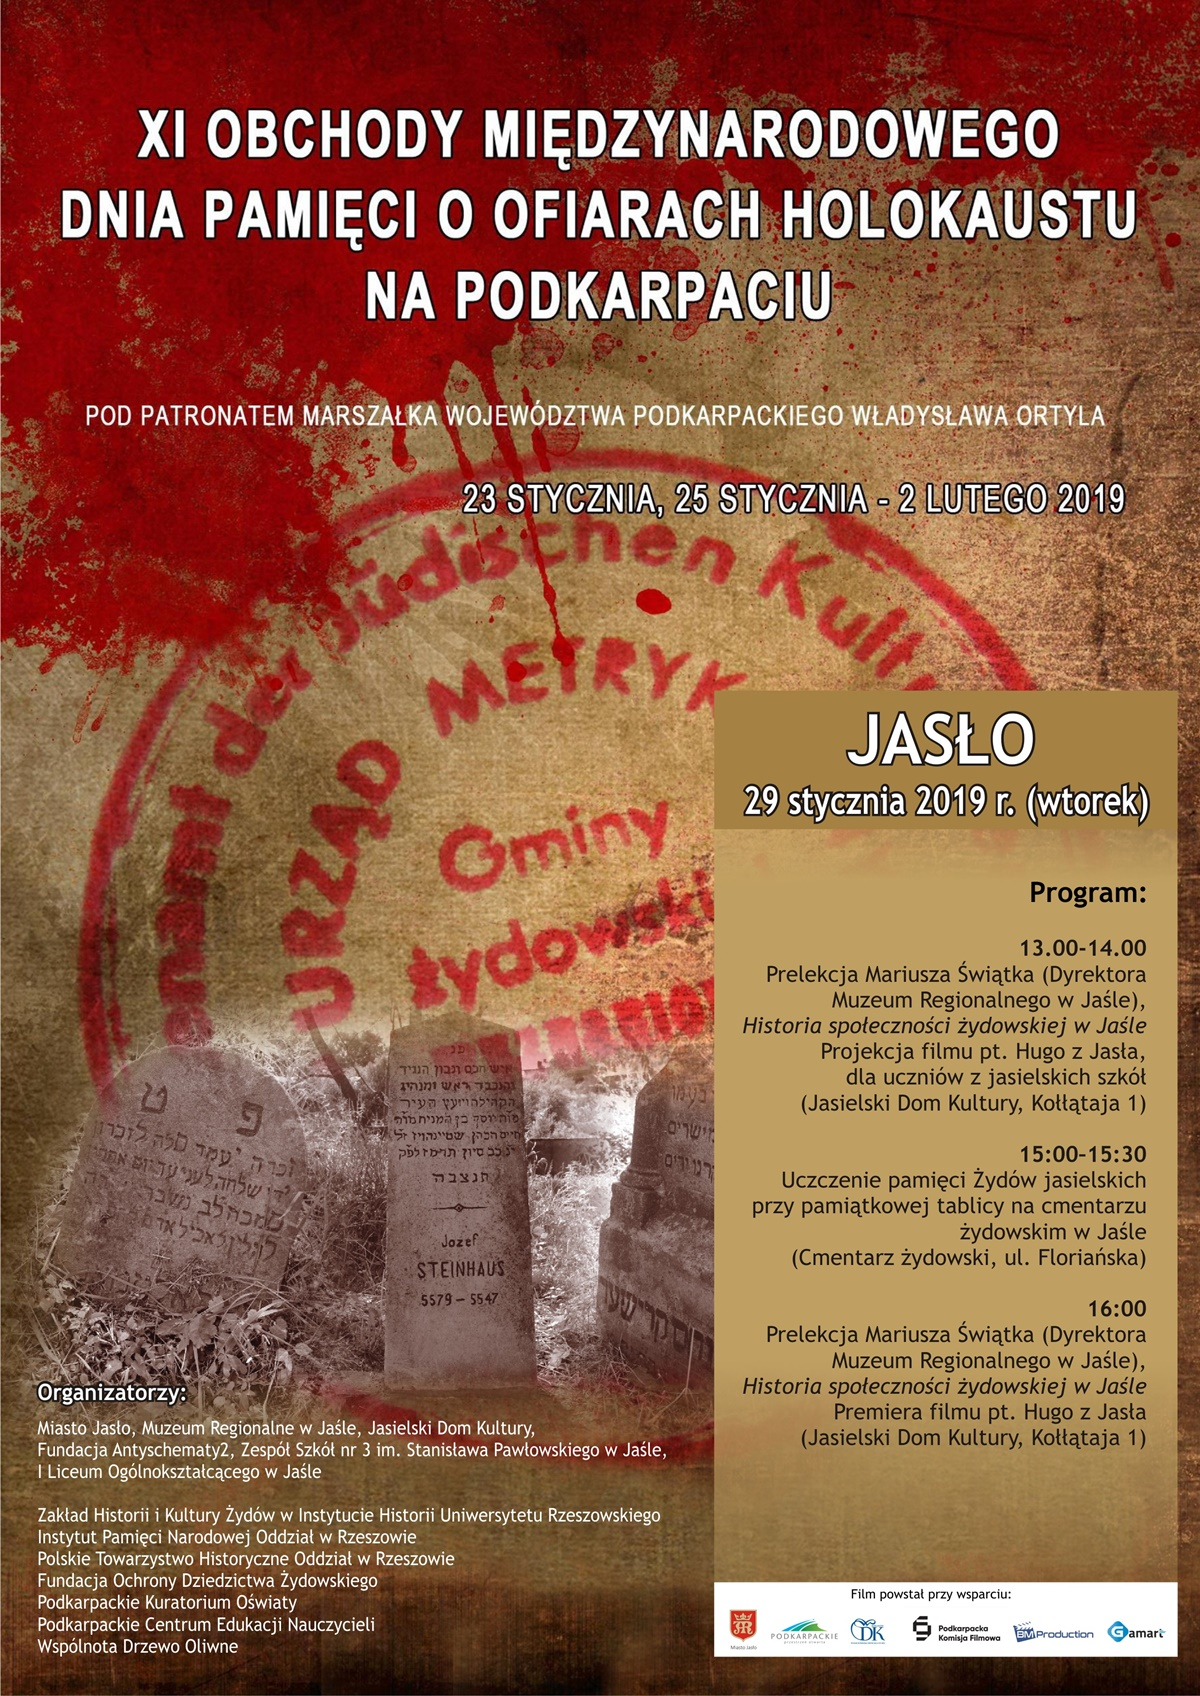 http://www.terazjaslo.pl/wp-content/uploads/2019/01/Dzie%C5%84-Pami%C4%99ci-Ofiar-Holokaustu-2019-w-Ja%C5%9Ble.jpg